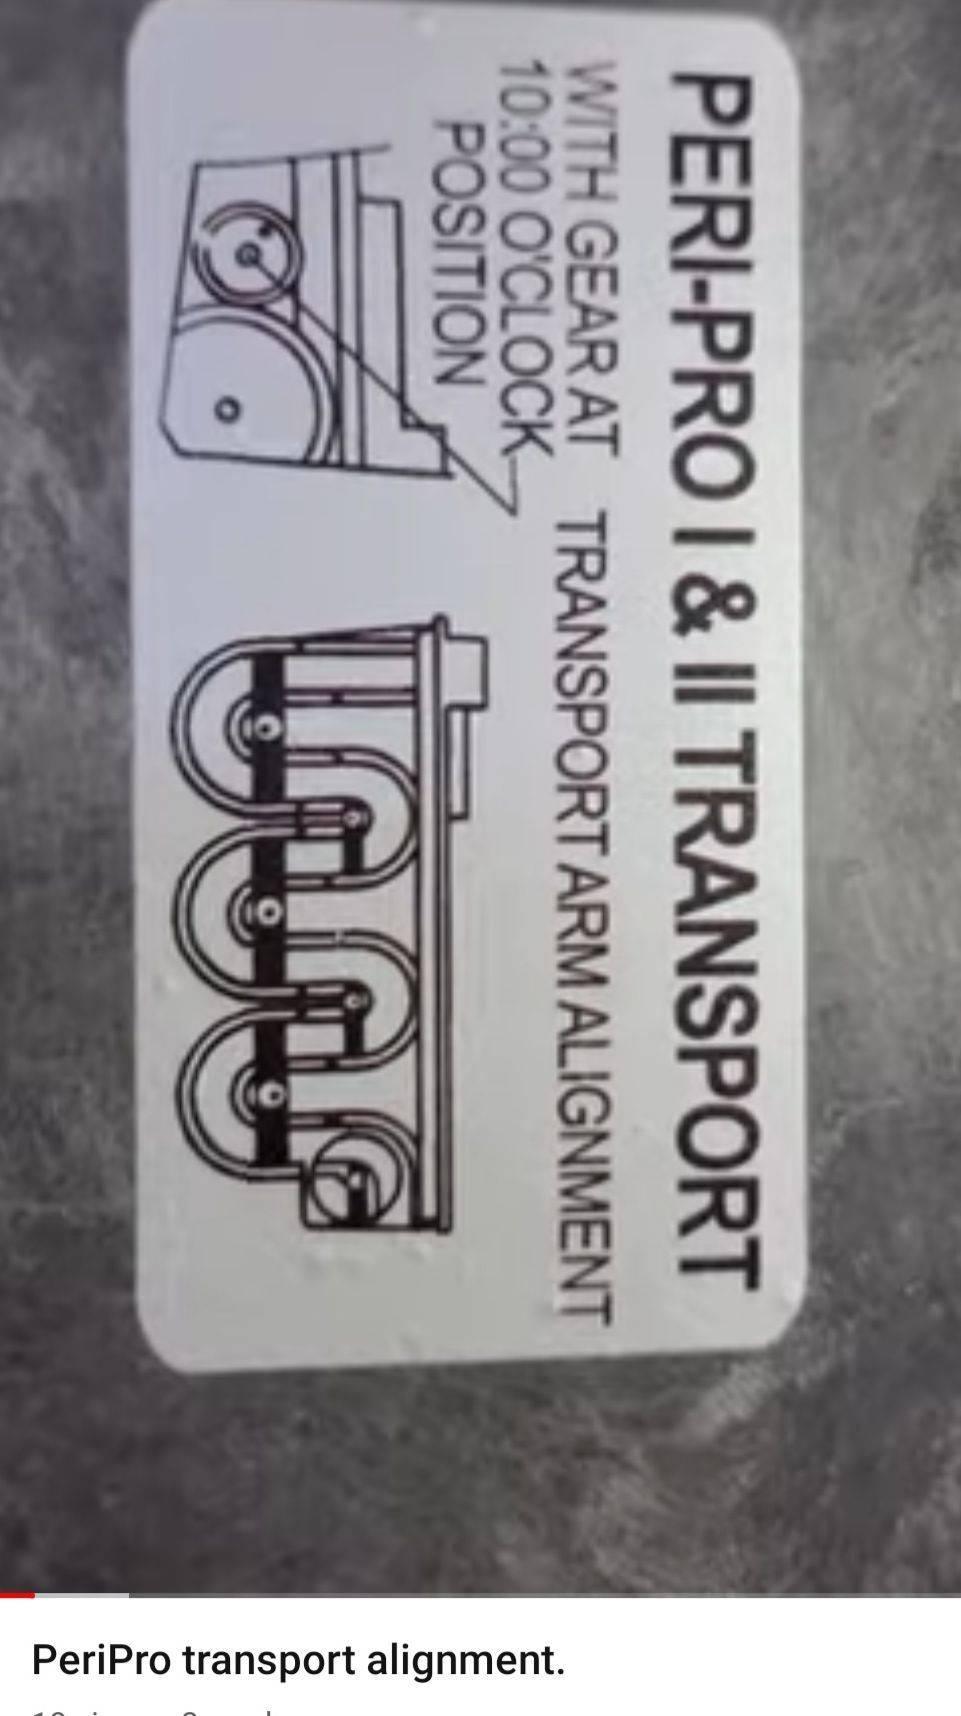 Peri Pro 1 & 2 Transport Alignment sticker